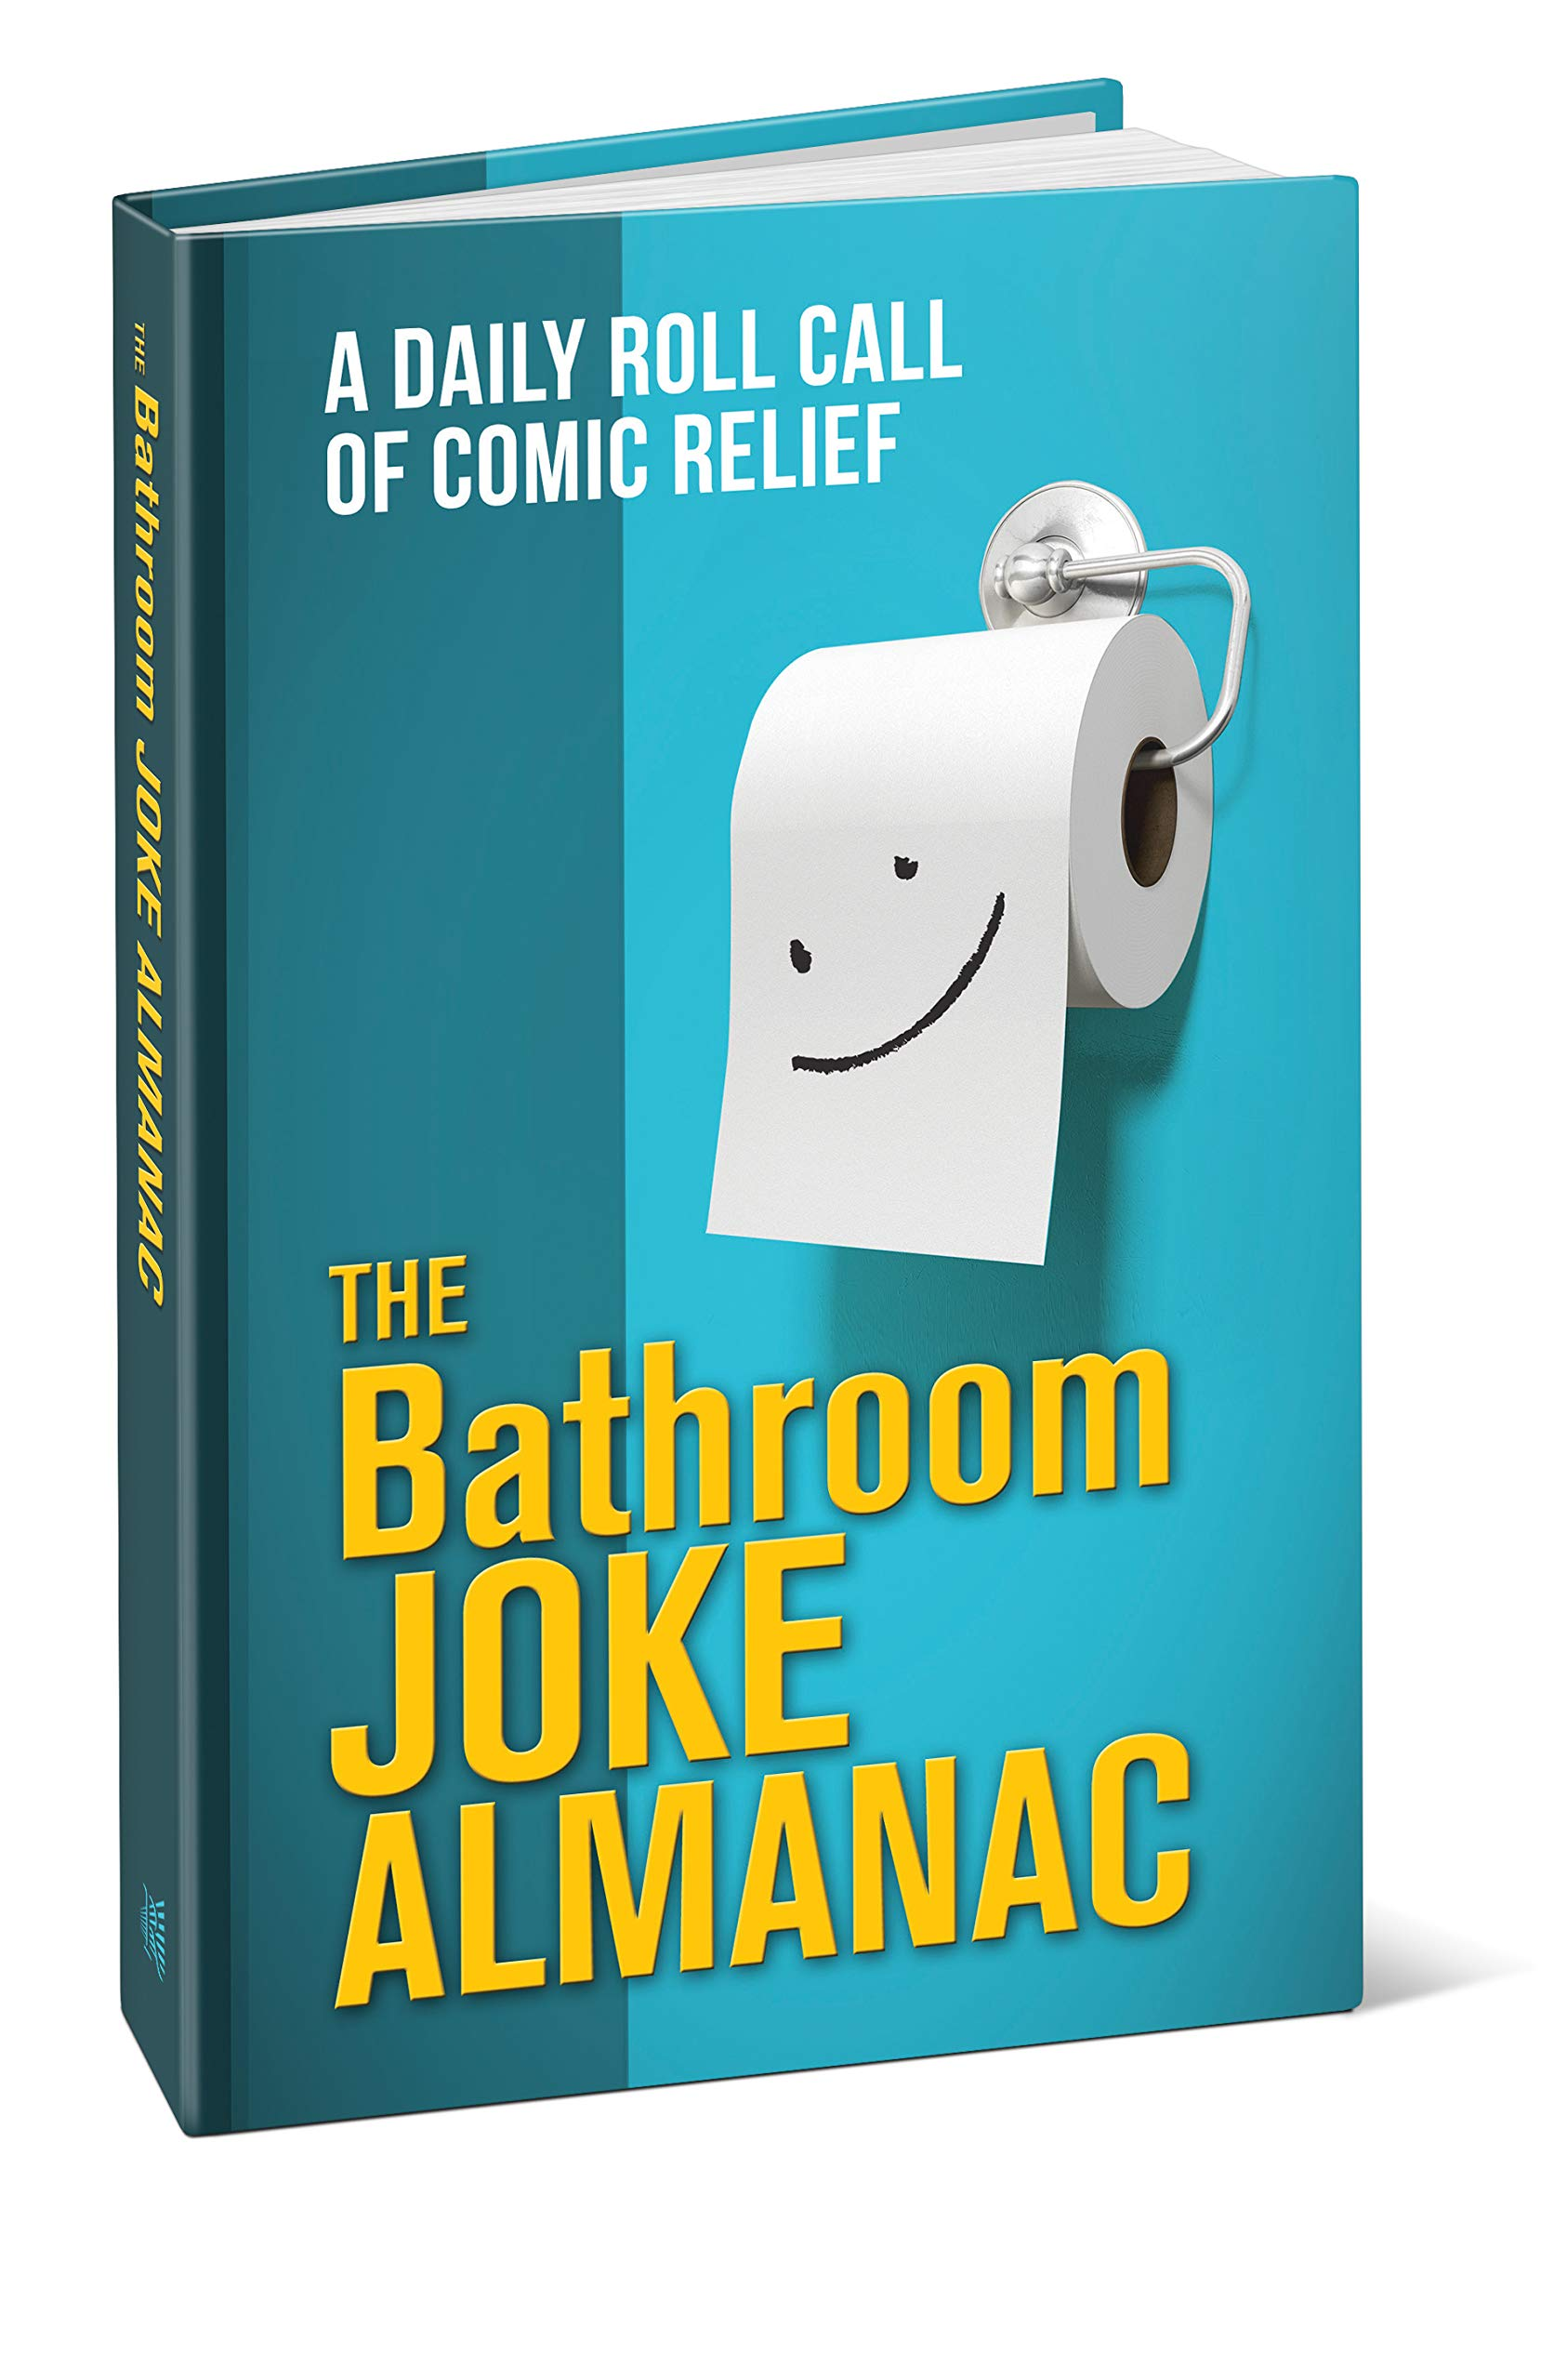 The Bathroom Joke Almanac Jack Kreismer 9781603871518 Amazon Com Books